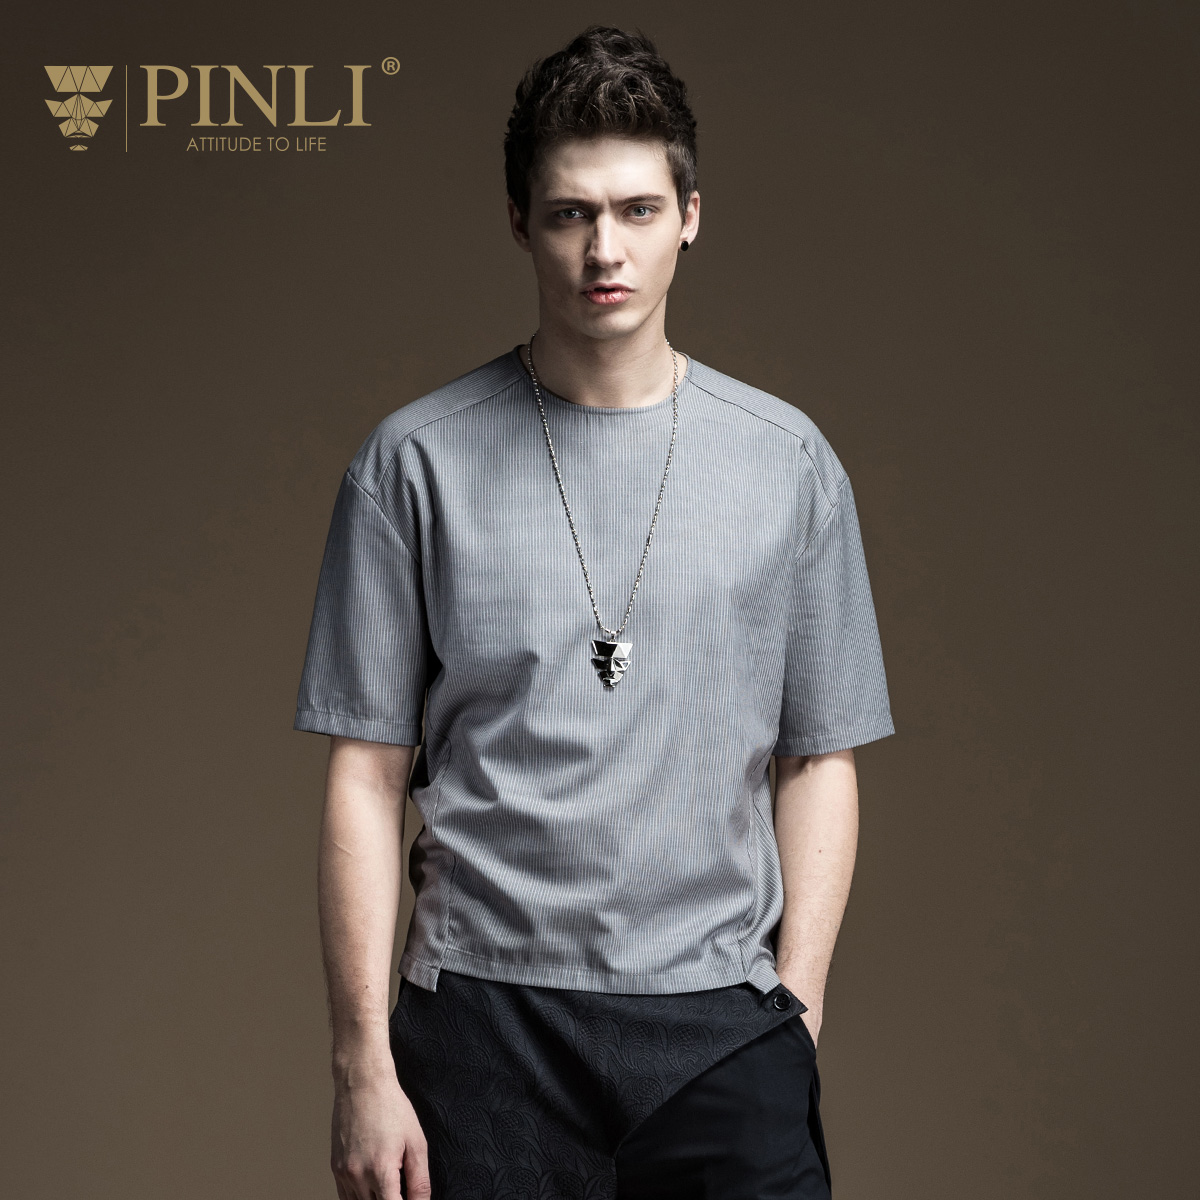 Pinli Real Fashion Solid O-neck Bamboo Fiber No 2017 Summer New Men's Slim - Irregular Short Sleeved T-shirt B172211099